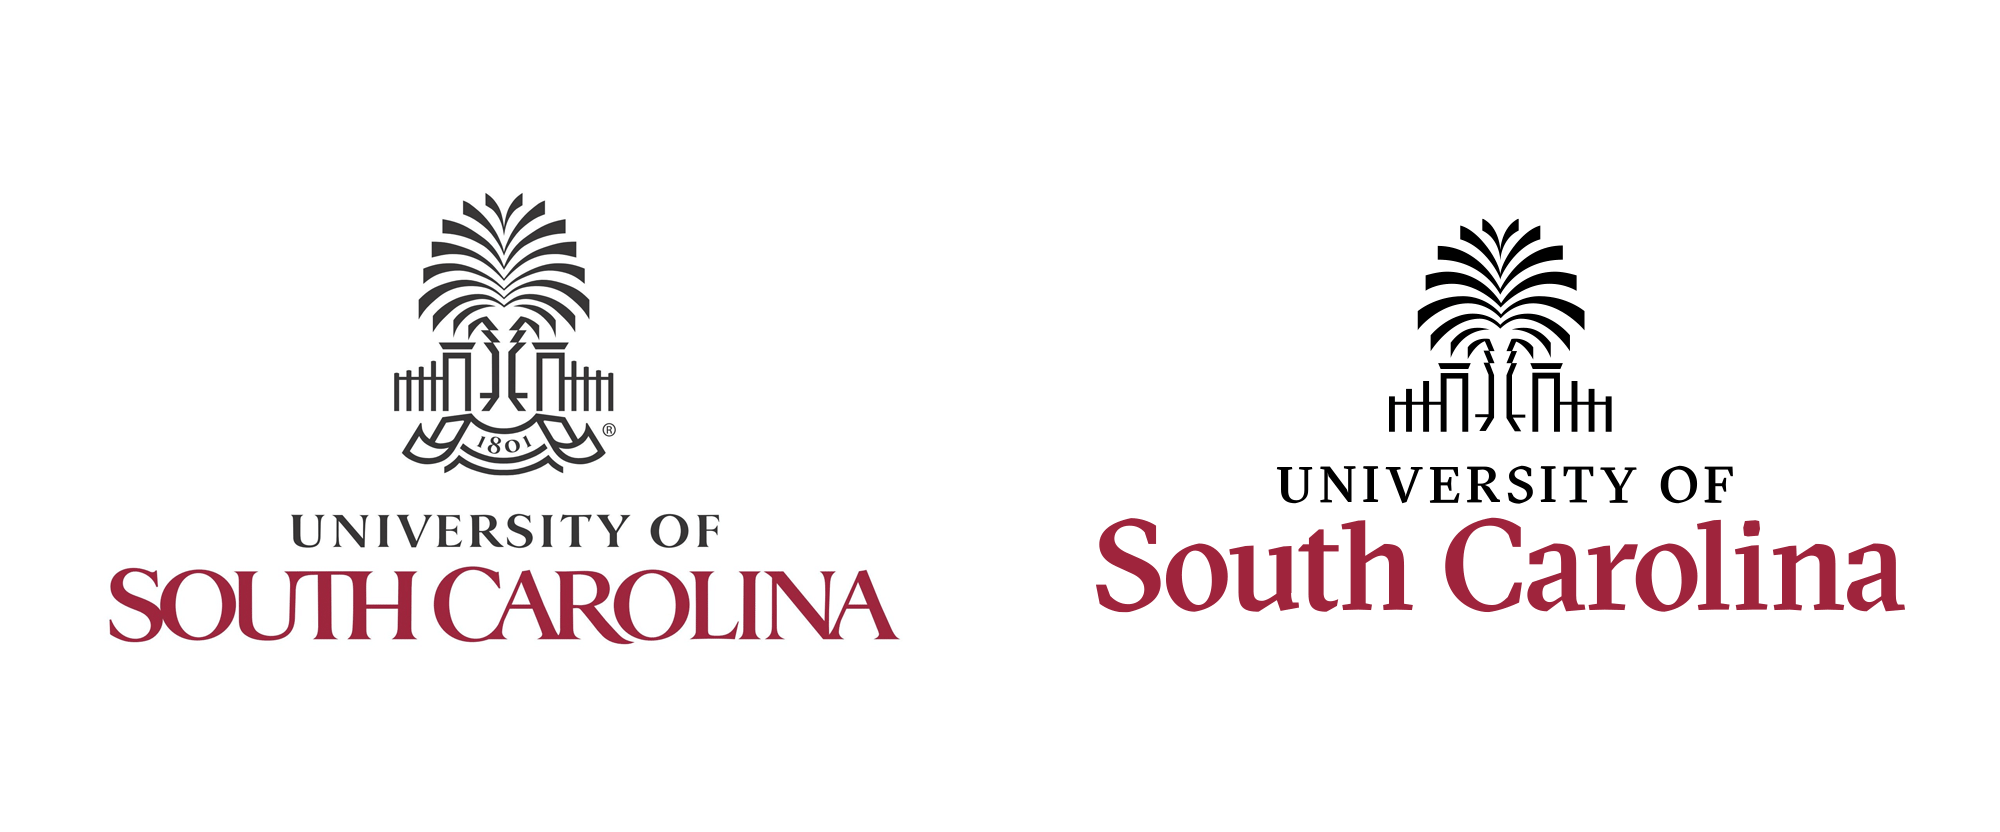 New Logos for University of South Carolina